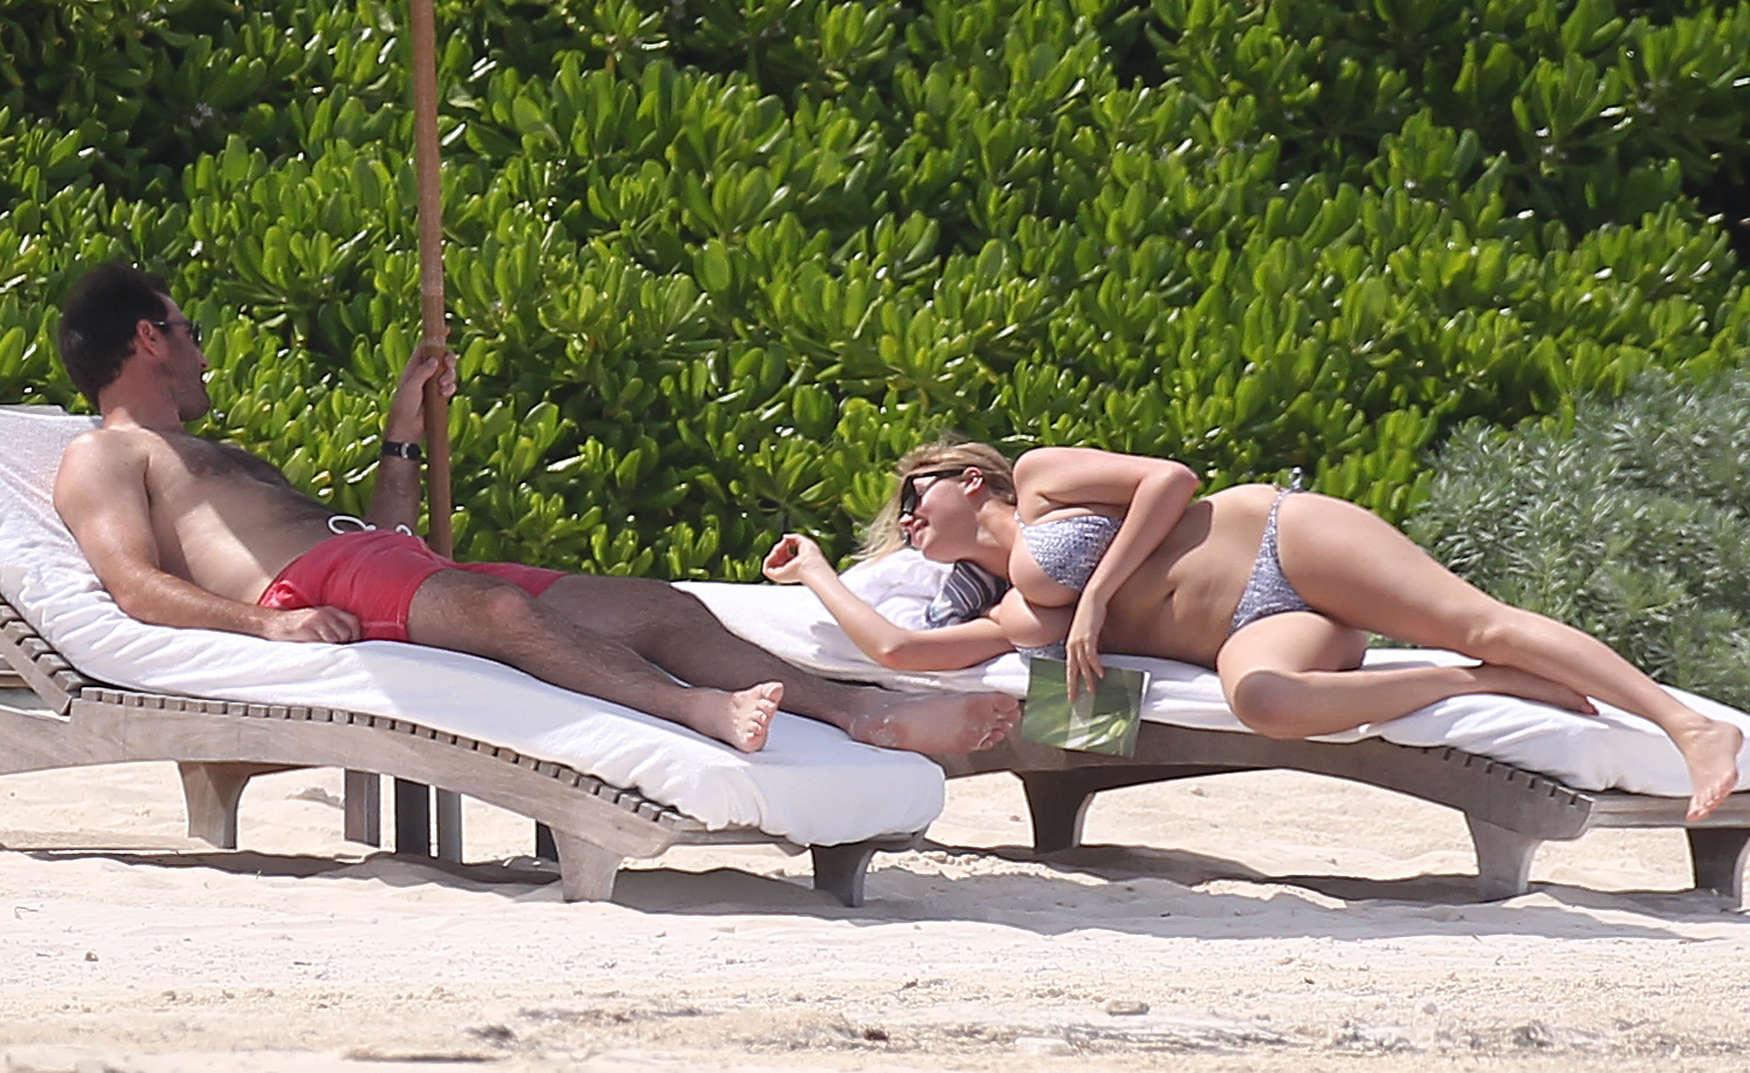 Kate-Upton-bikini:-Mexico-2014-08.jpg